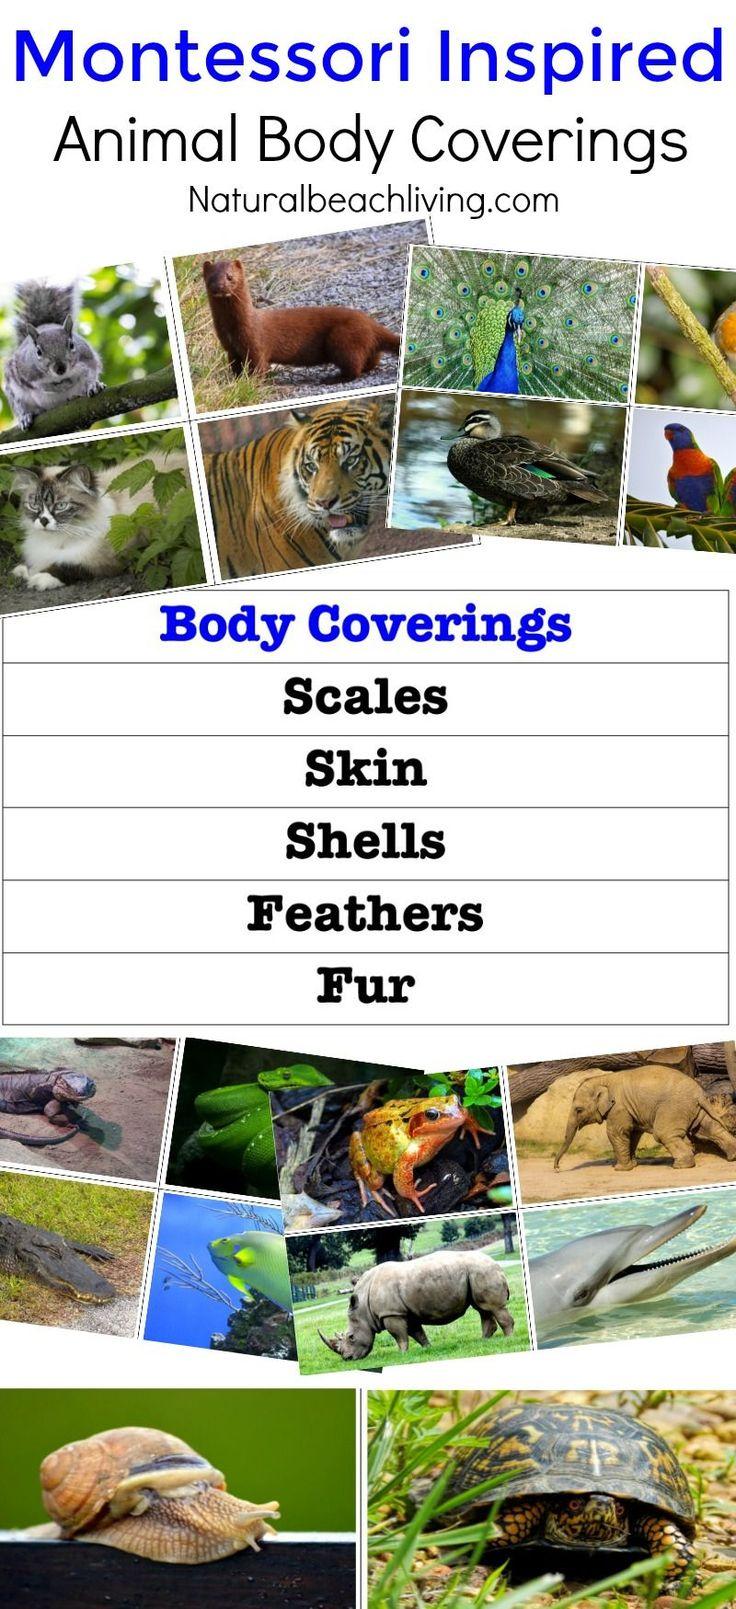 Montessori inspired zoology, animal activities for preschool and kindergarten, free printables, Montessori Learning activities, Montessori animal ideas,